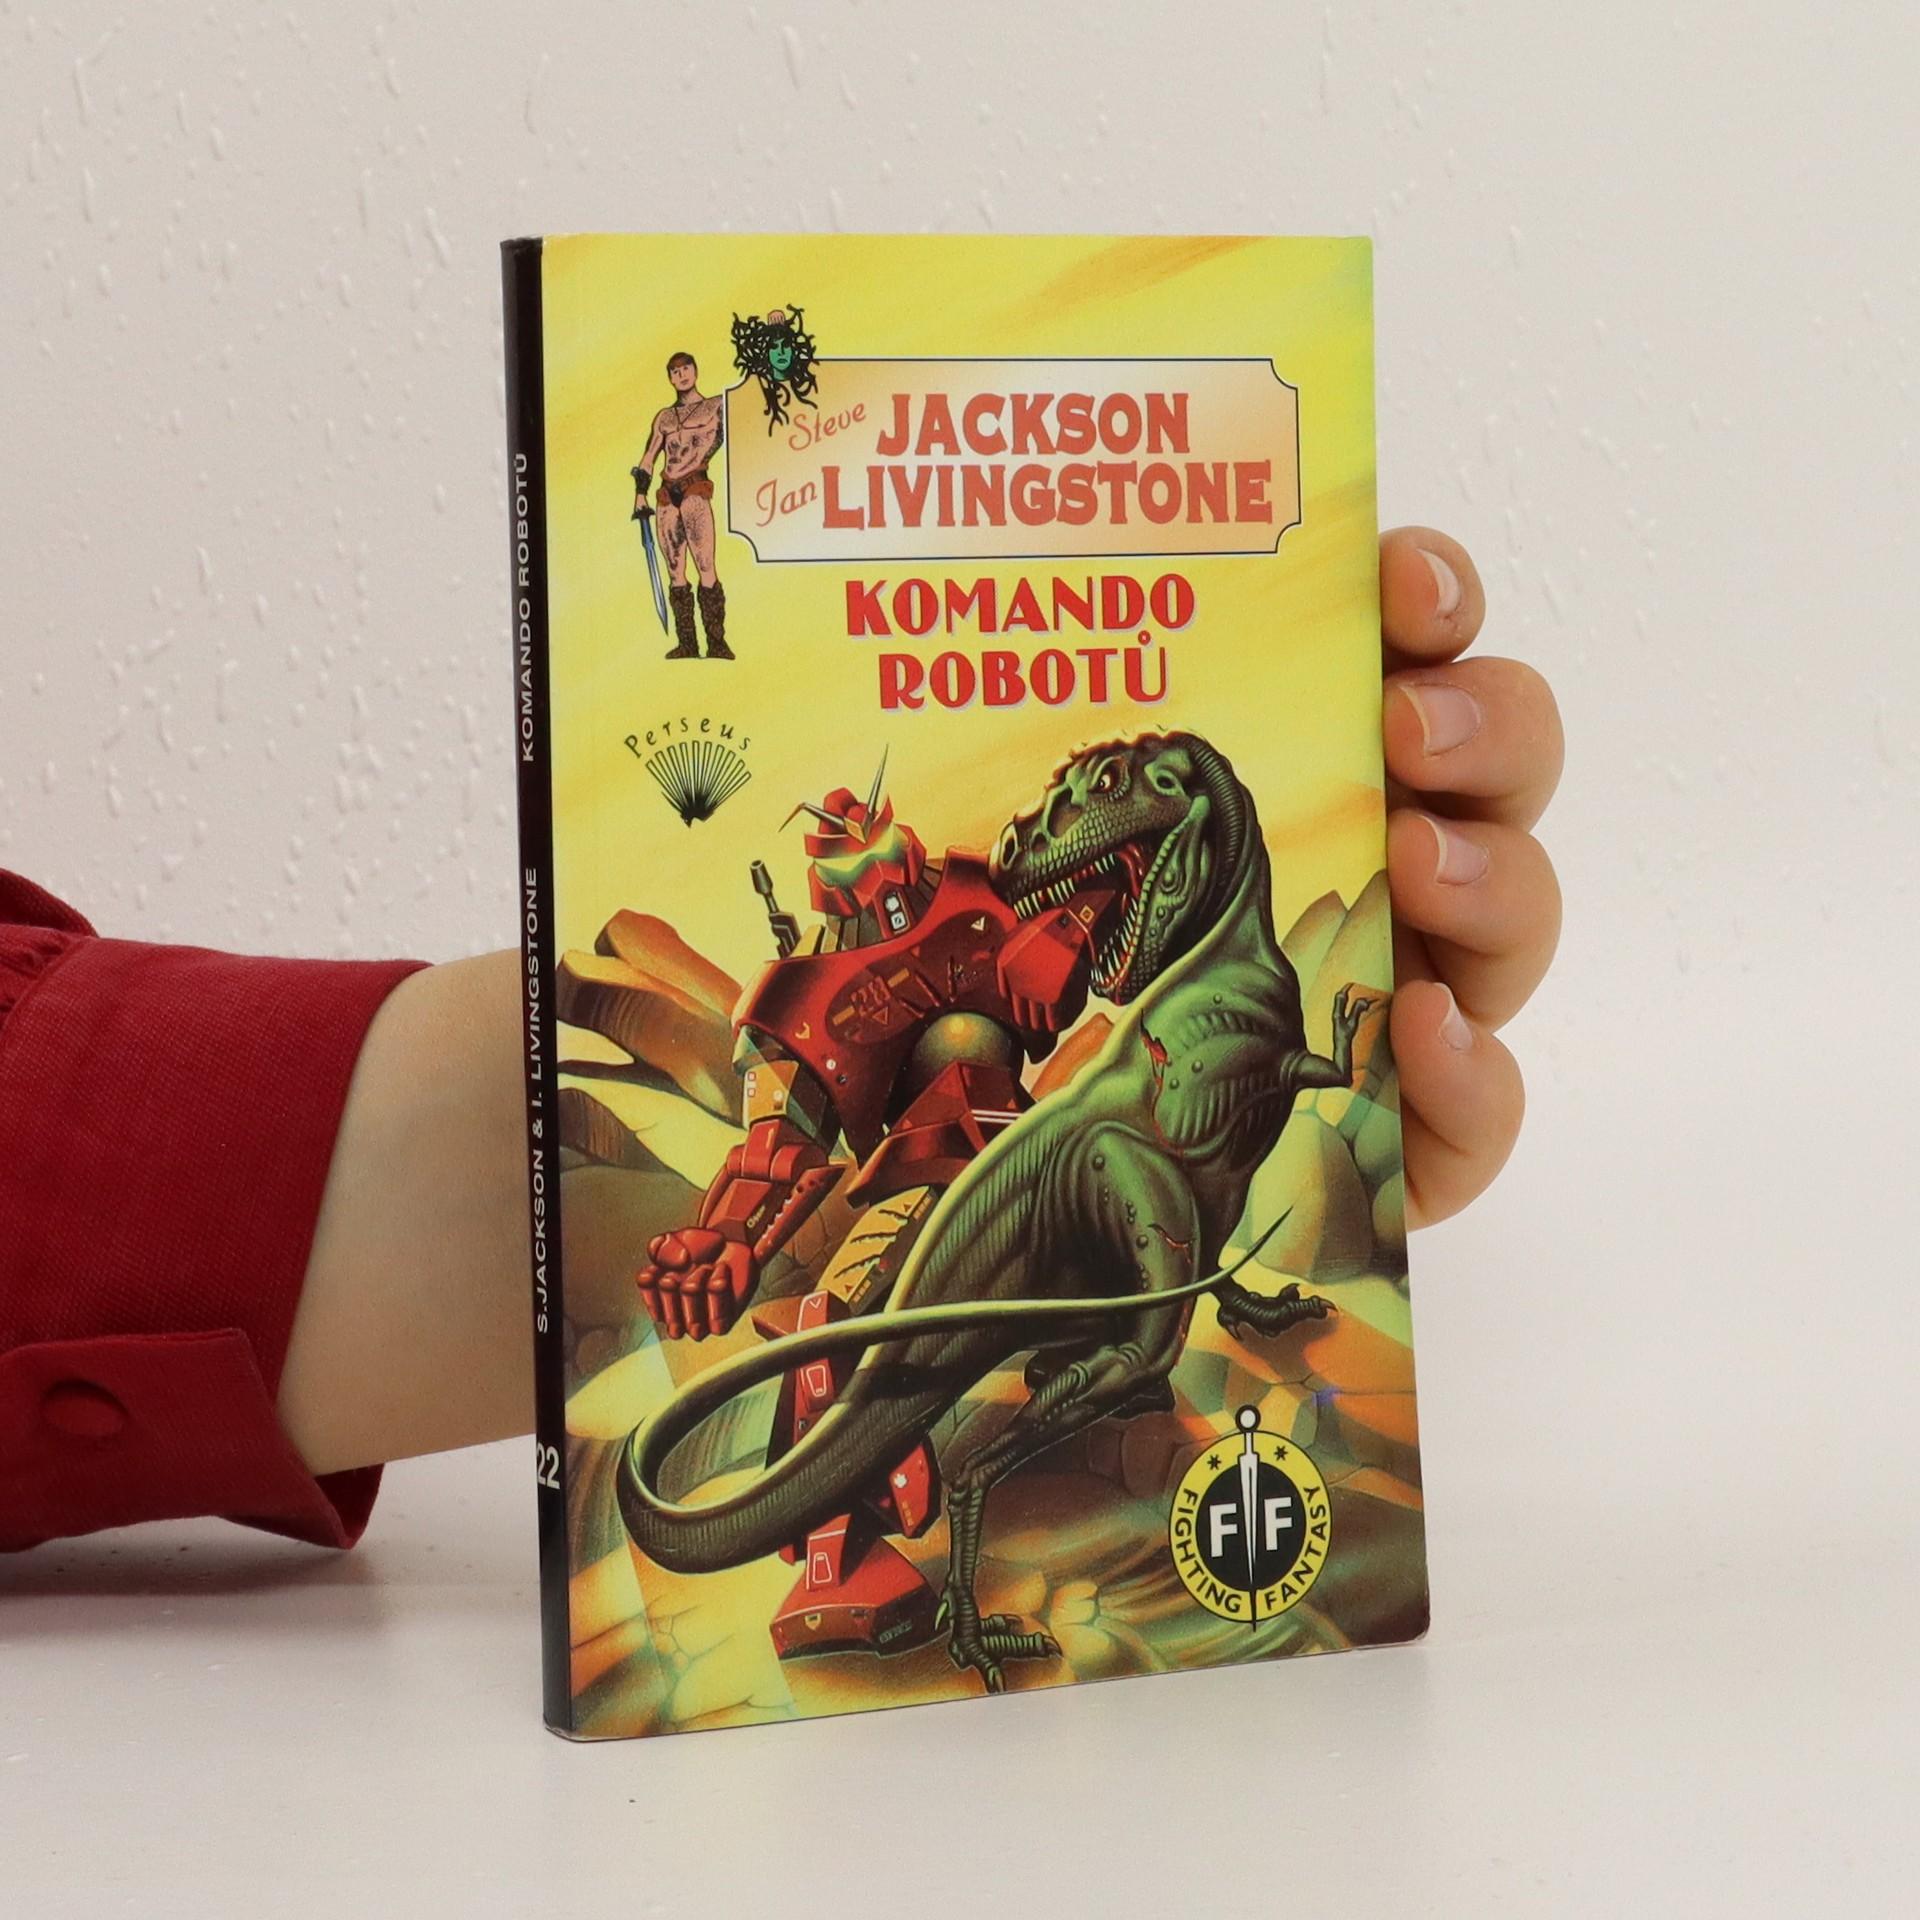 antikvární kniha Komando robotů, 1998